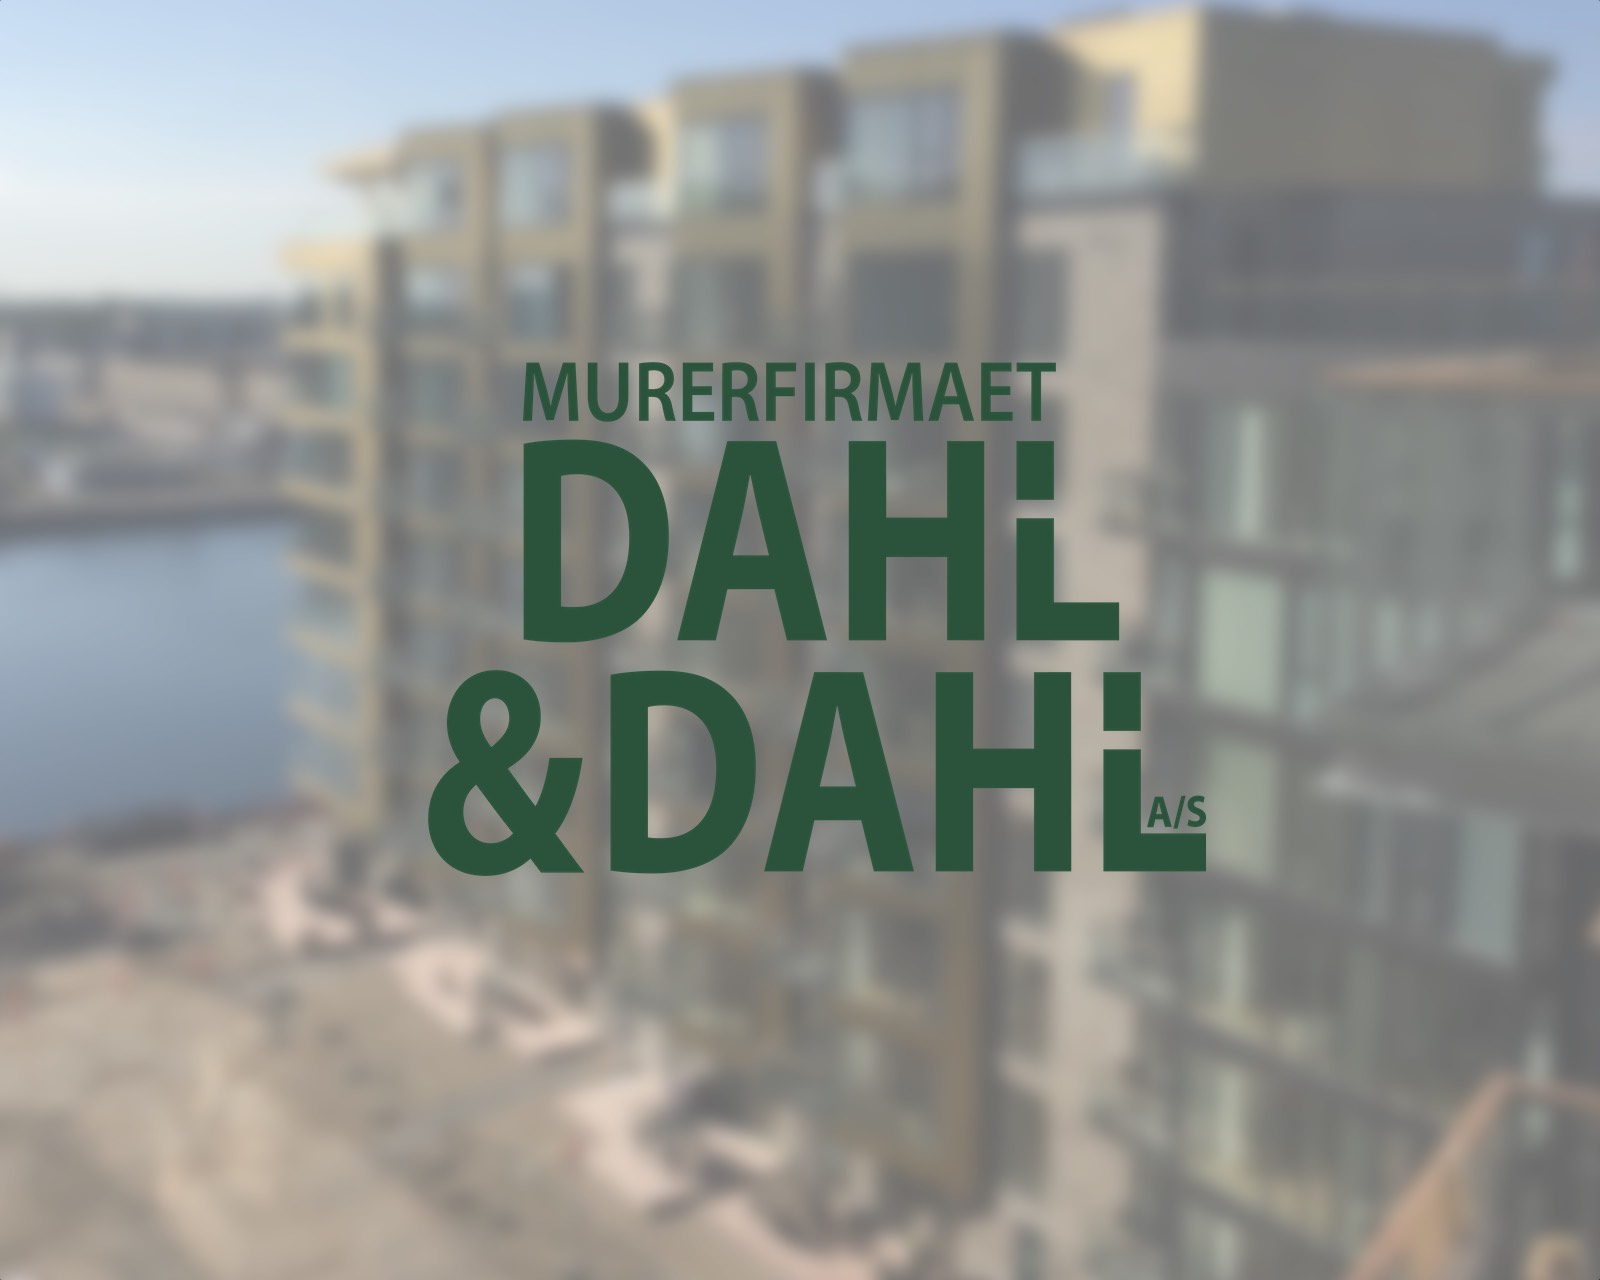 Case Dahl & Dahl.dk